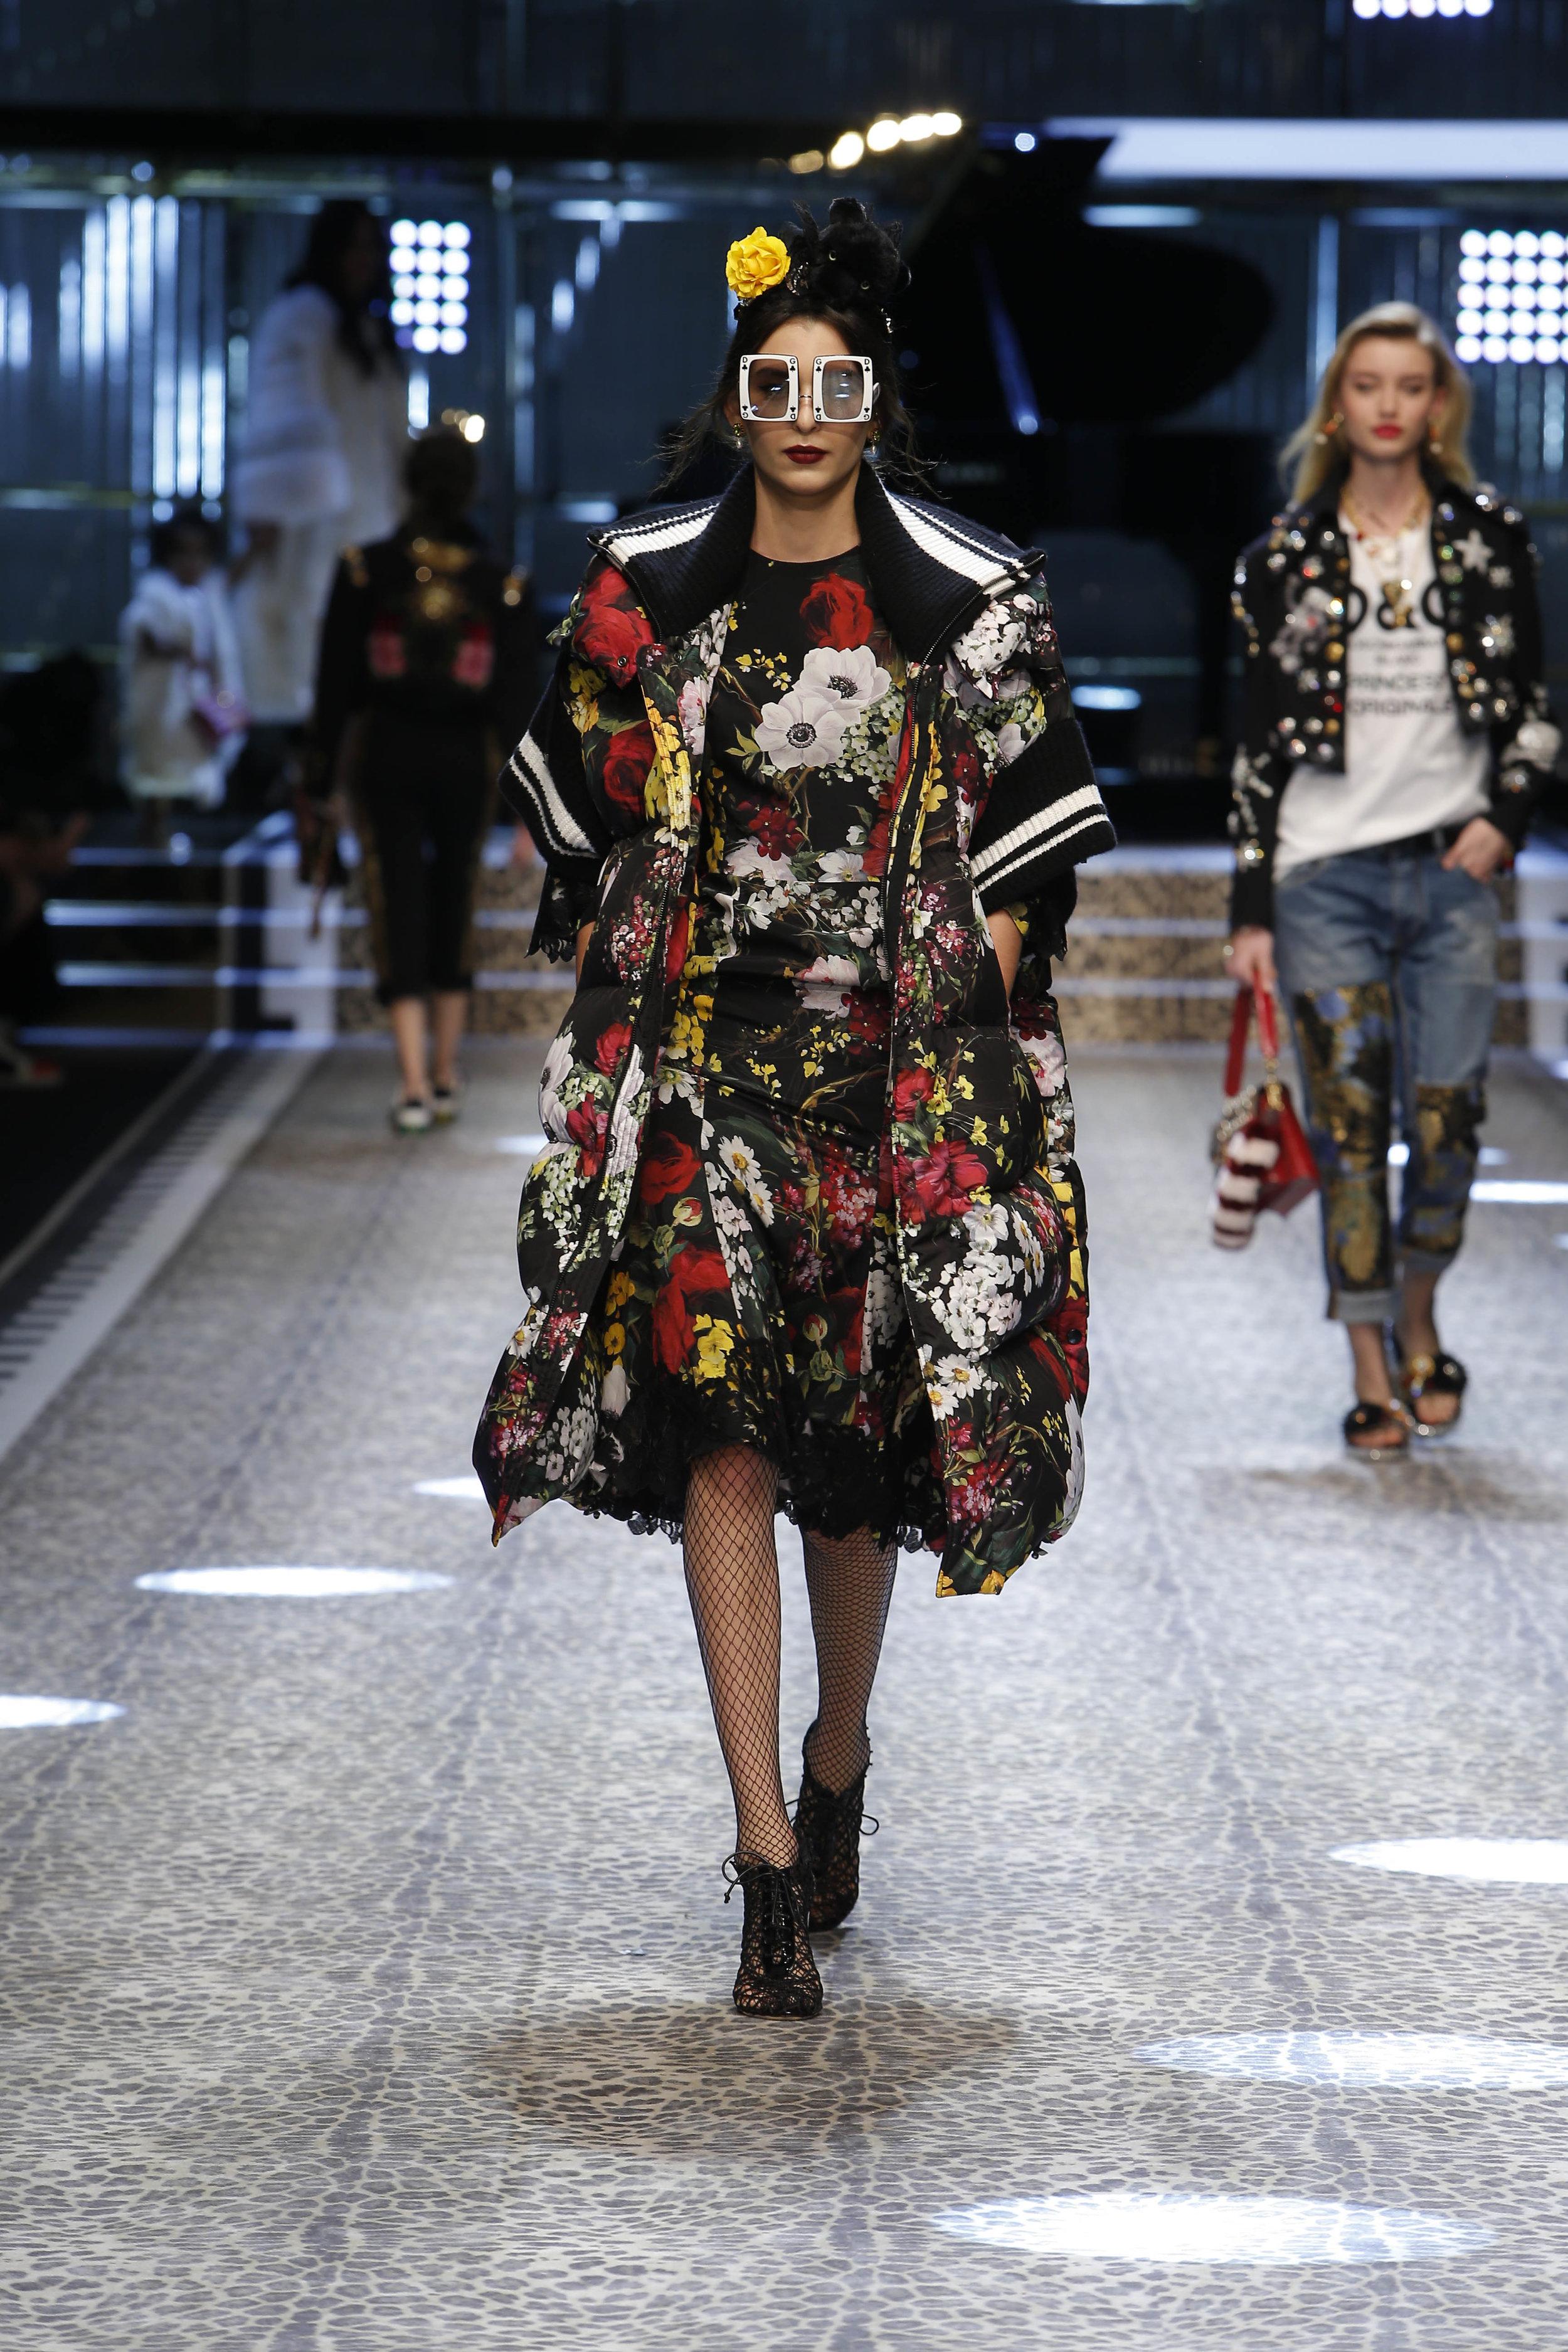 Dolce&Gabbana_women's fashion show fw17-18_Runway_images (51).jpg